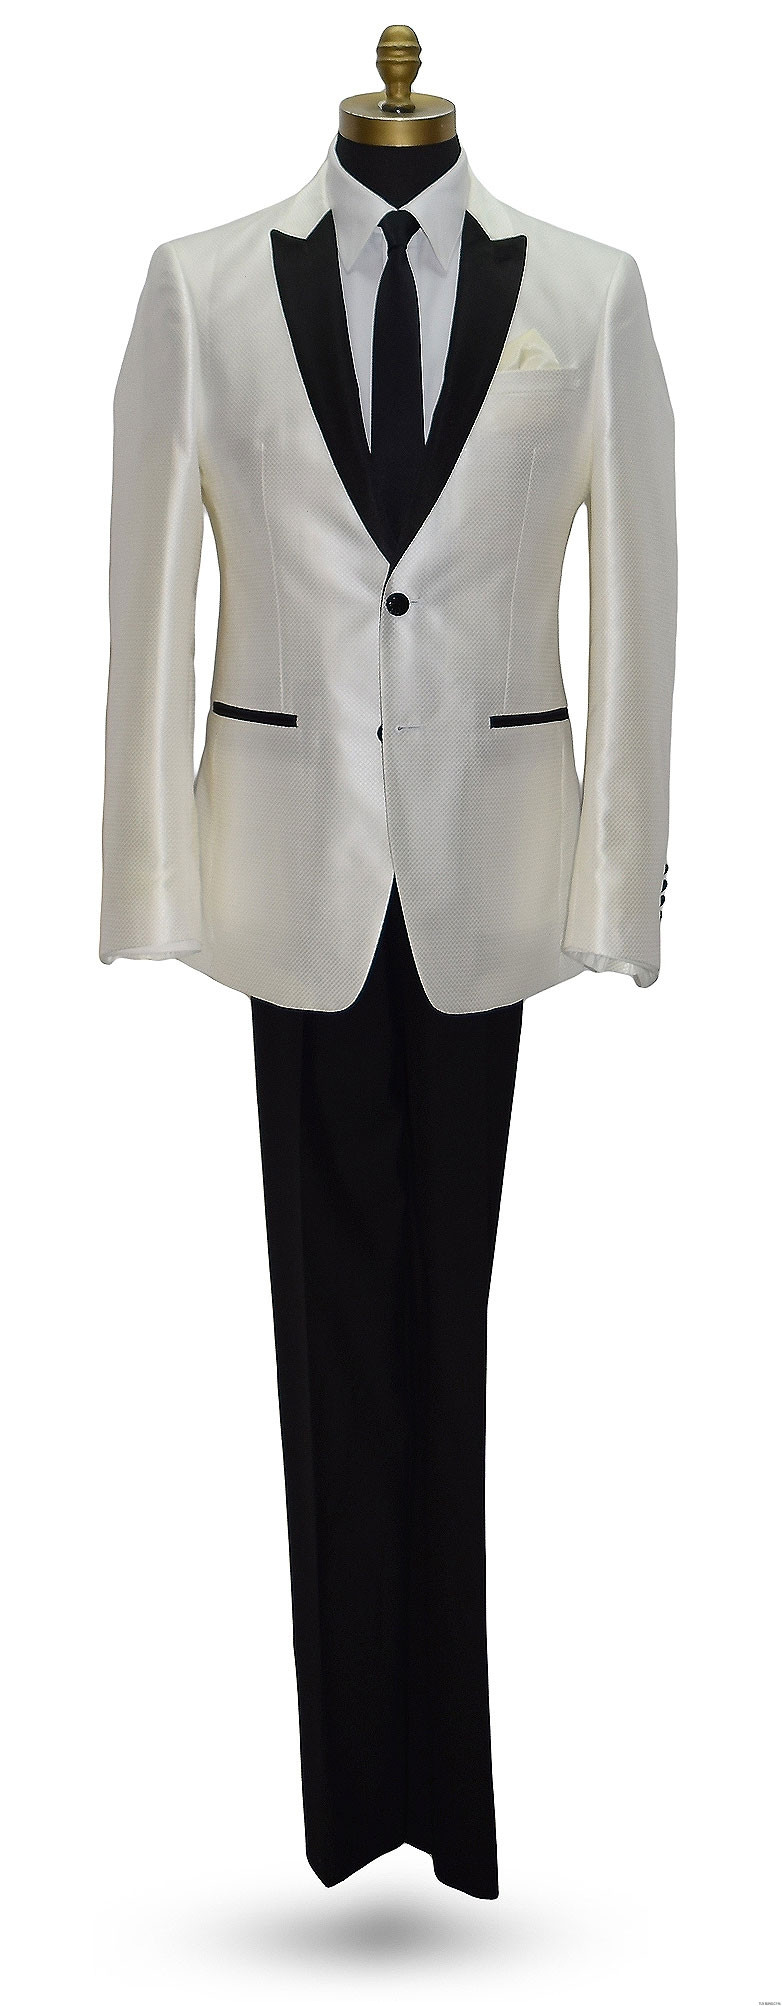 ivory tuxedo with long black skinny tie